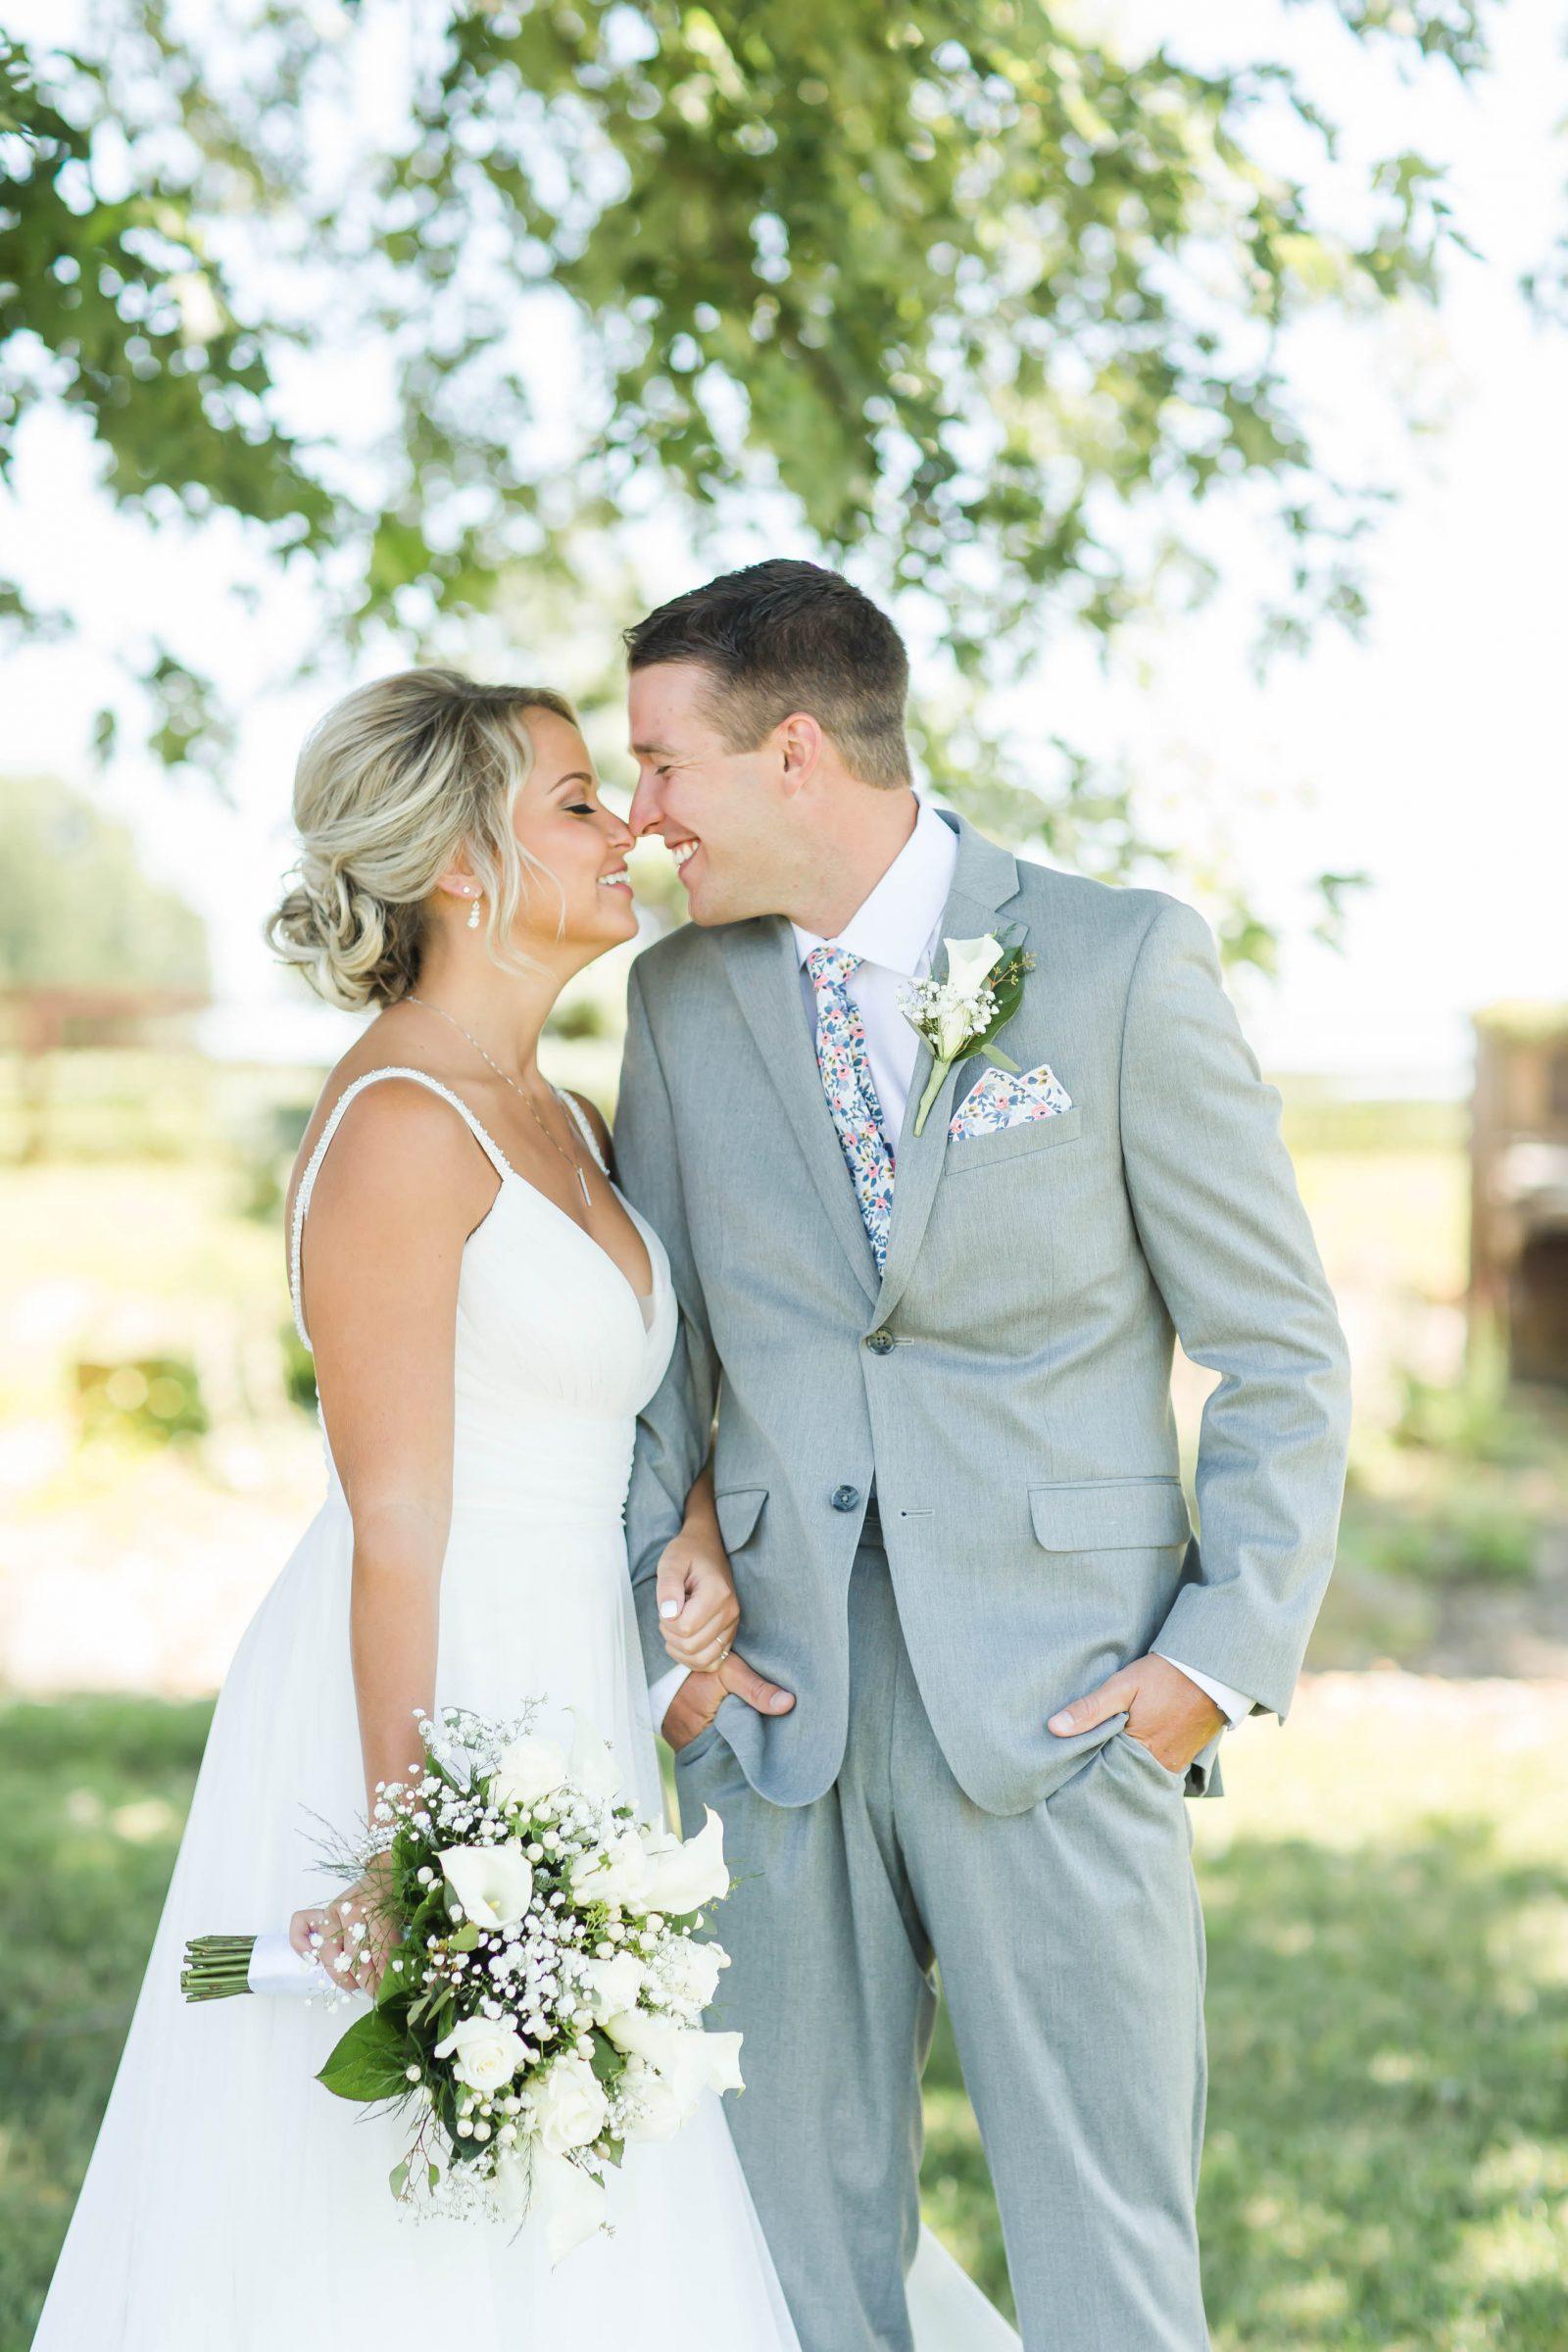 peacock-ridge-summer-wedding-photographer-akron-ohio-loren-jackson-photography-32